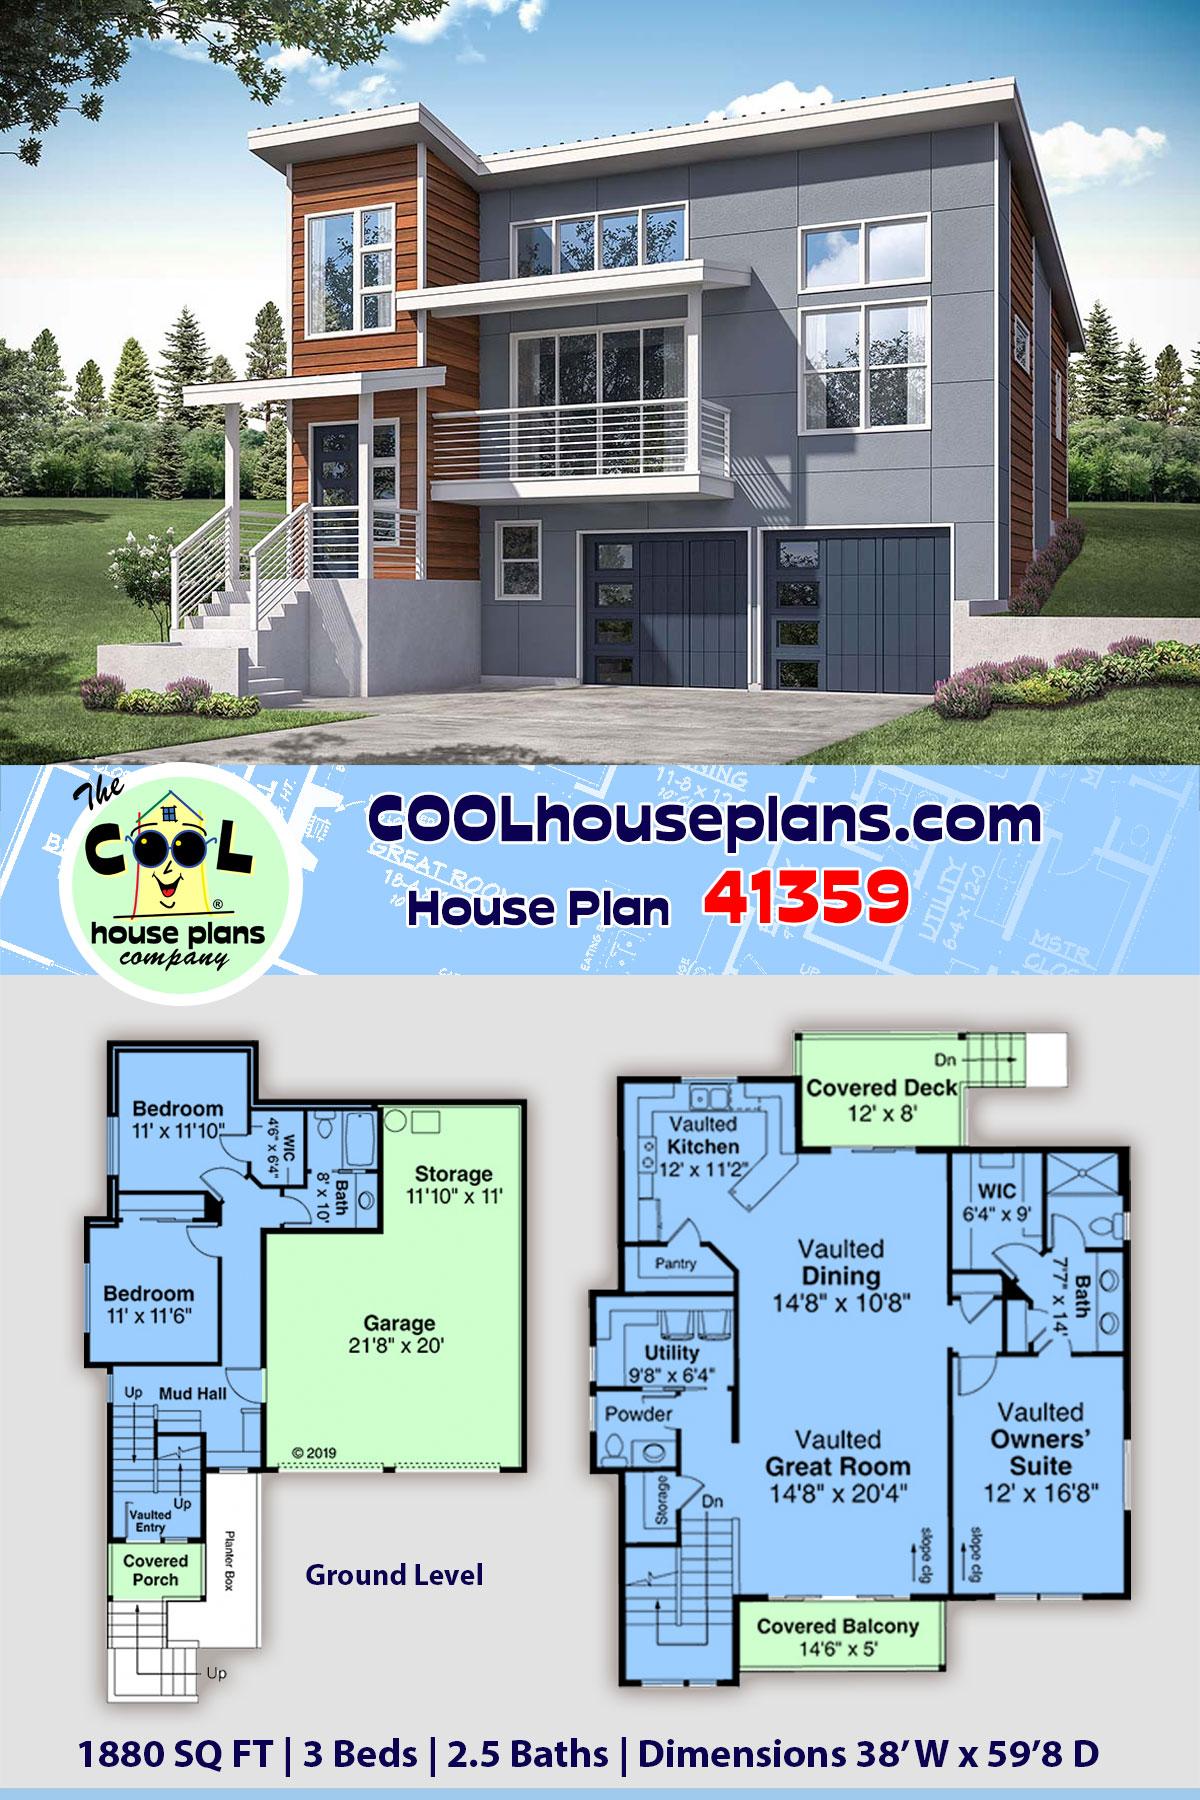 Contemporary, Modern, Narrow Lot House Plan 41359 with 3 Beds, 3 Baths, 2 Car Garage